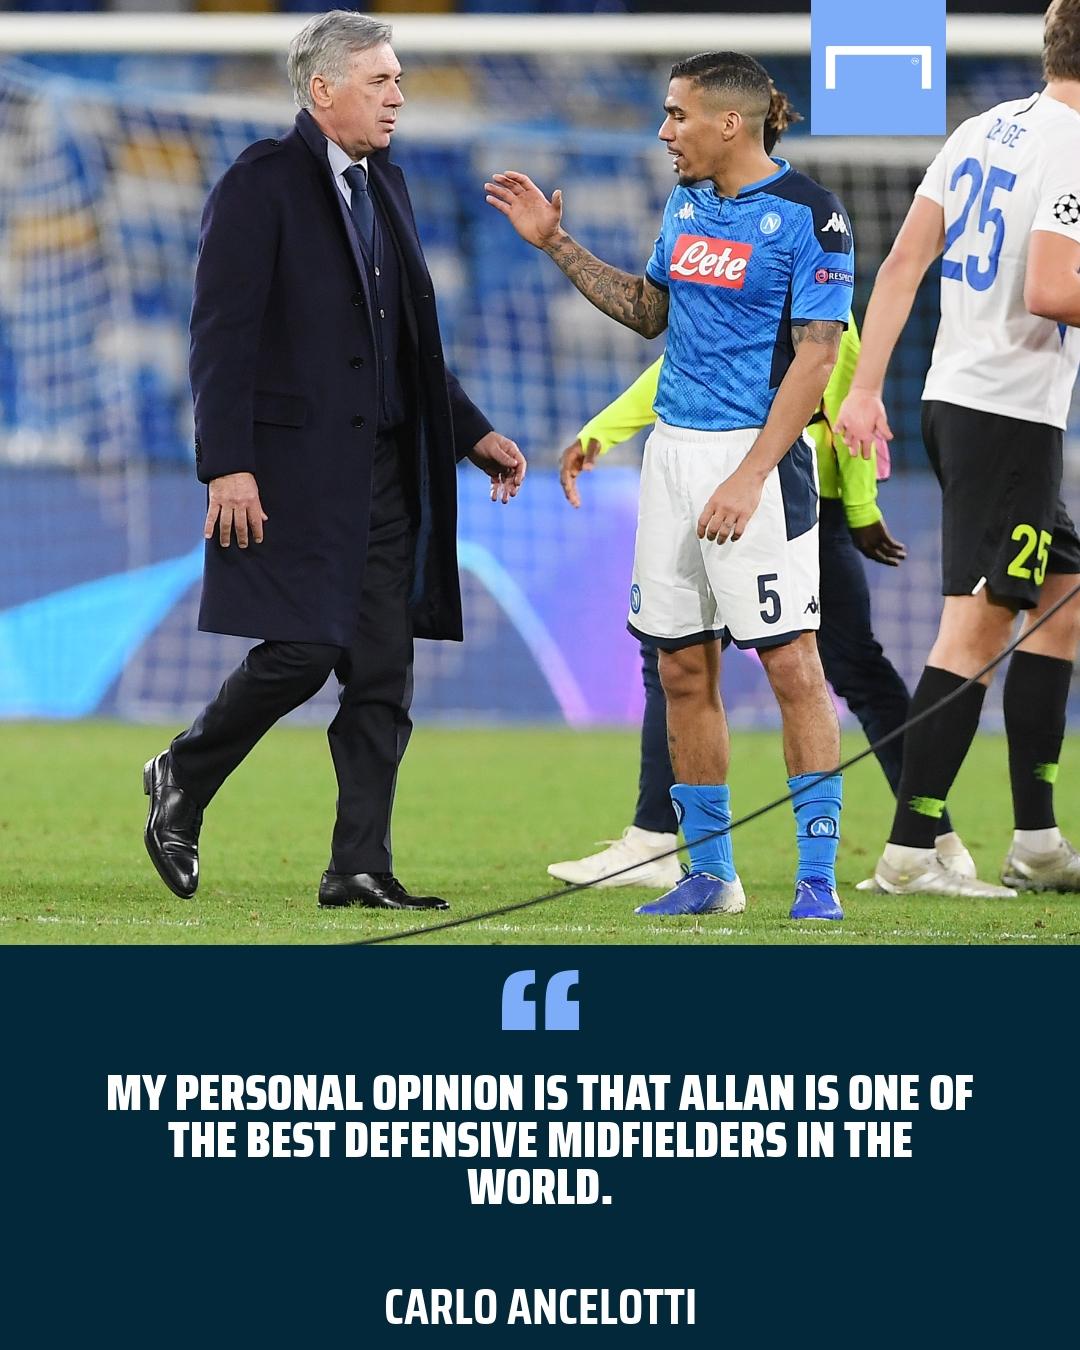 Valdano: James isn't joining Everton, he's going to Ancelotti FC